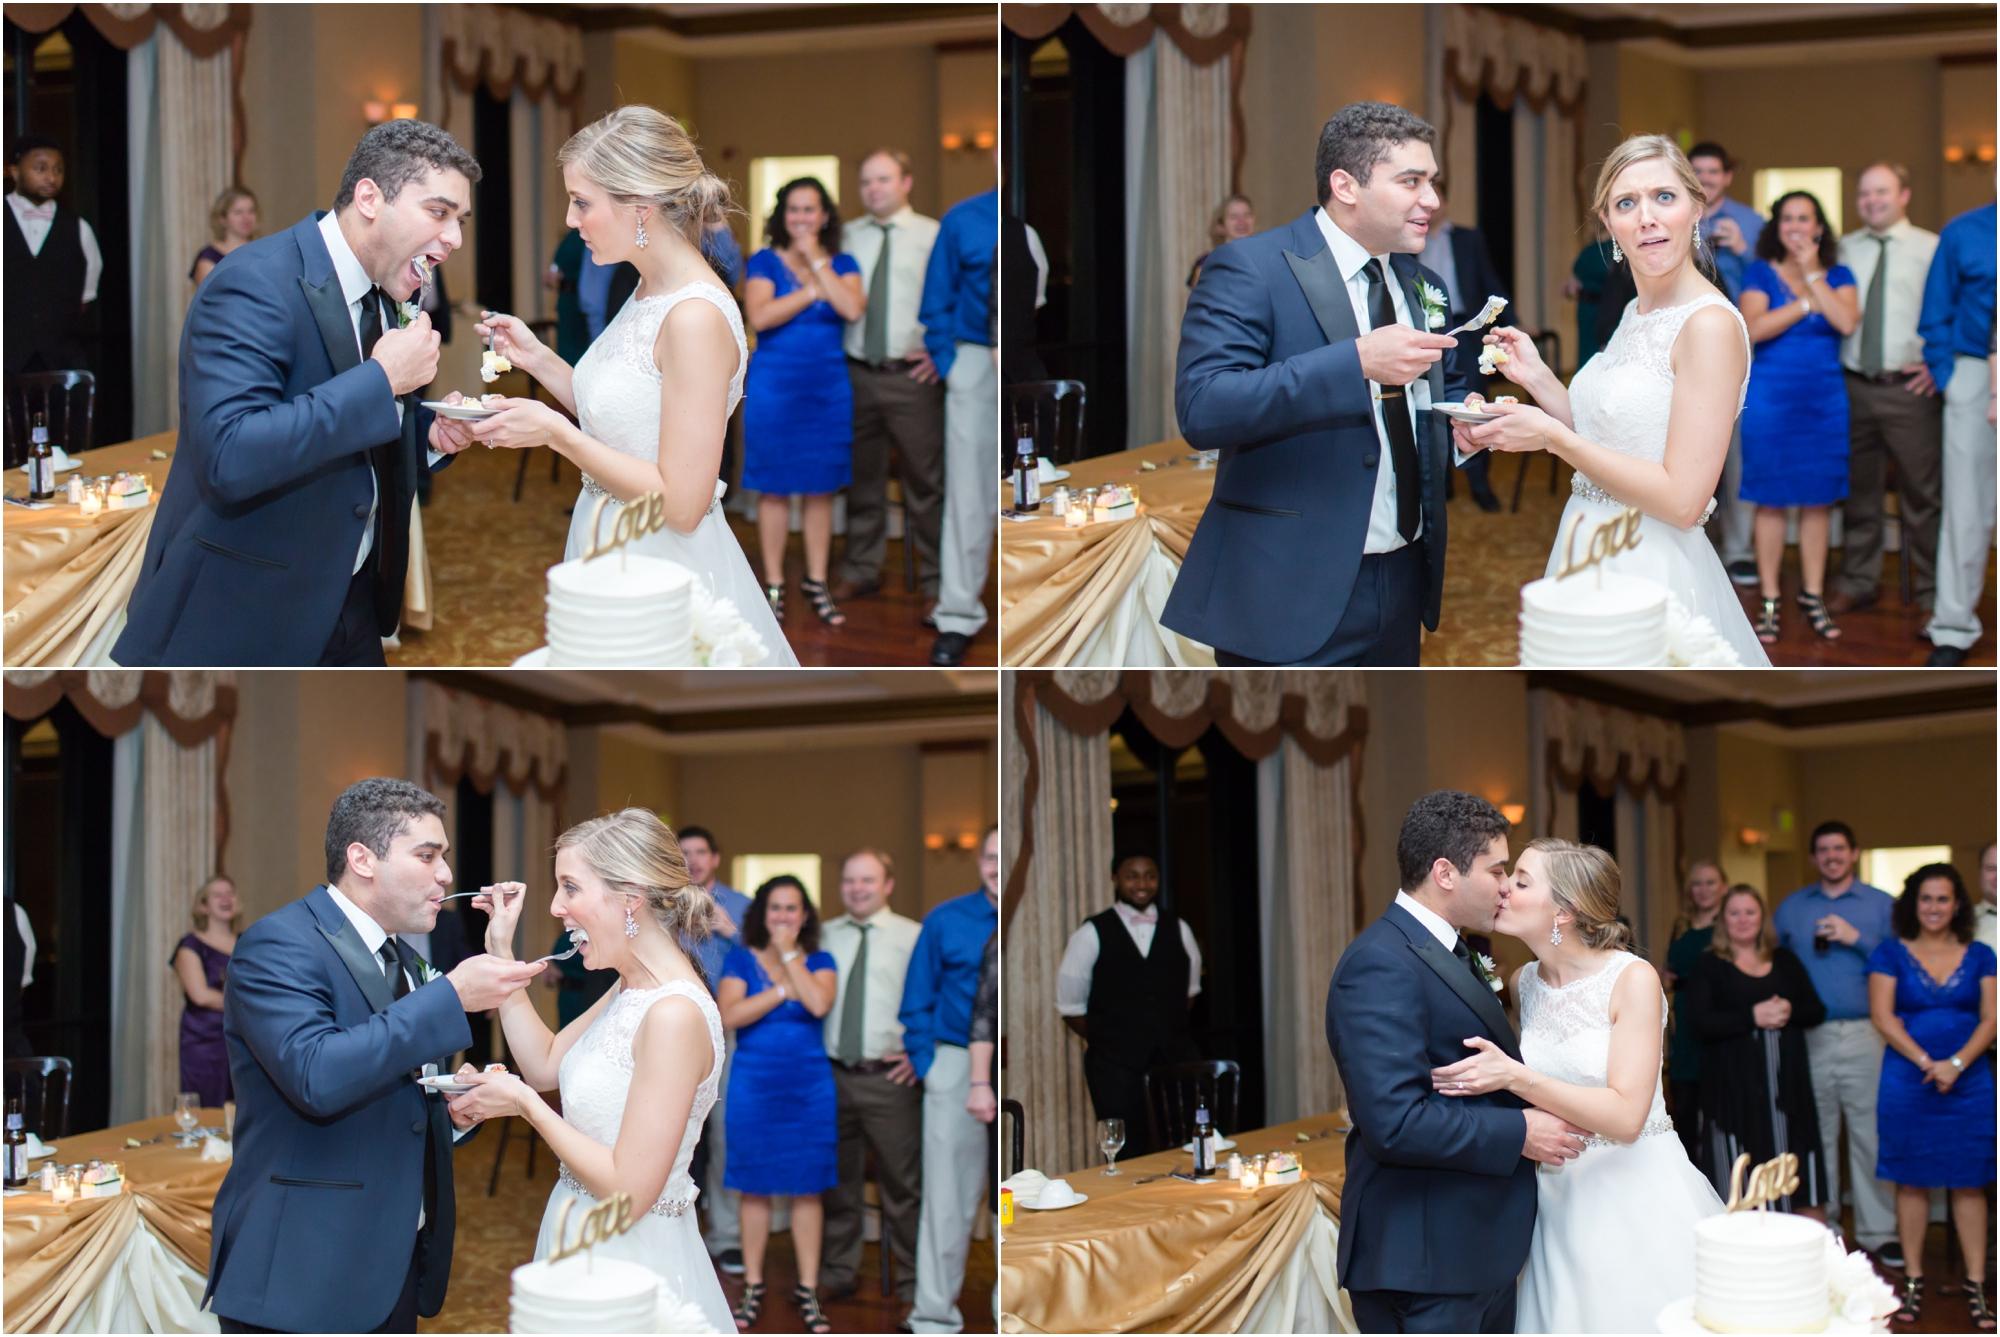 6-Finkel Wedding Reception-953_anna grace photography maryland wedding photographer turf valley.jpg